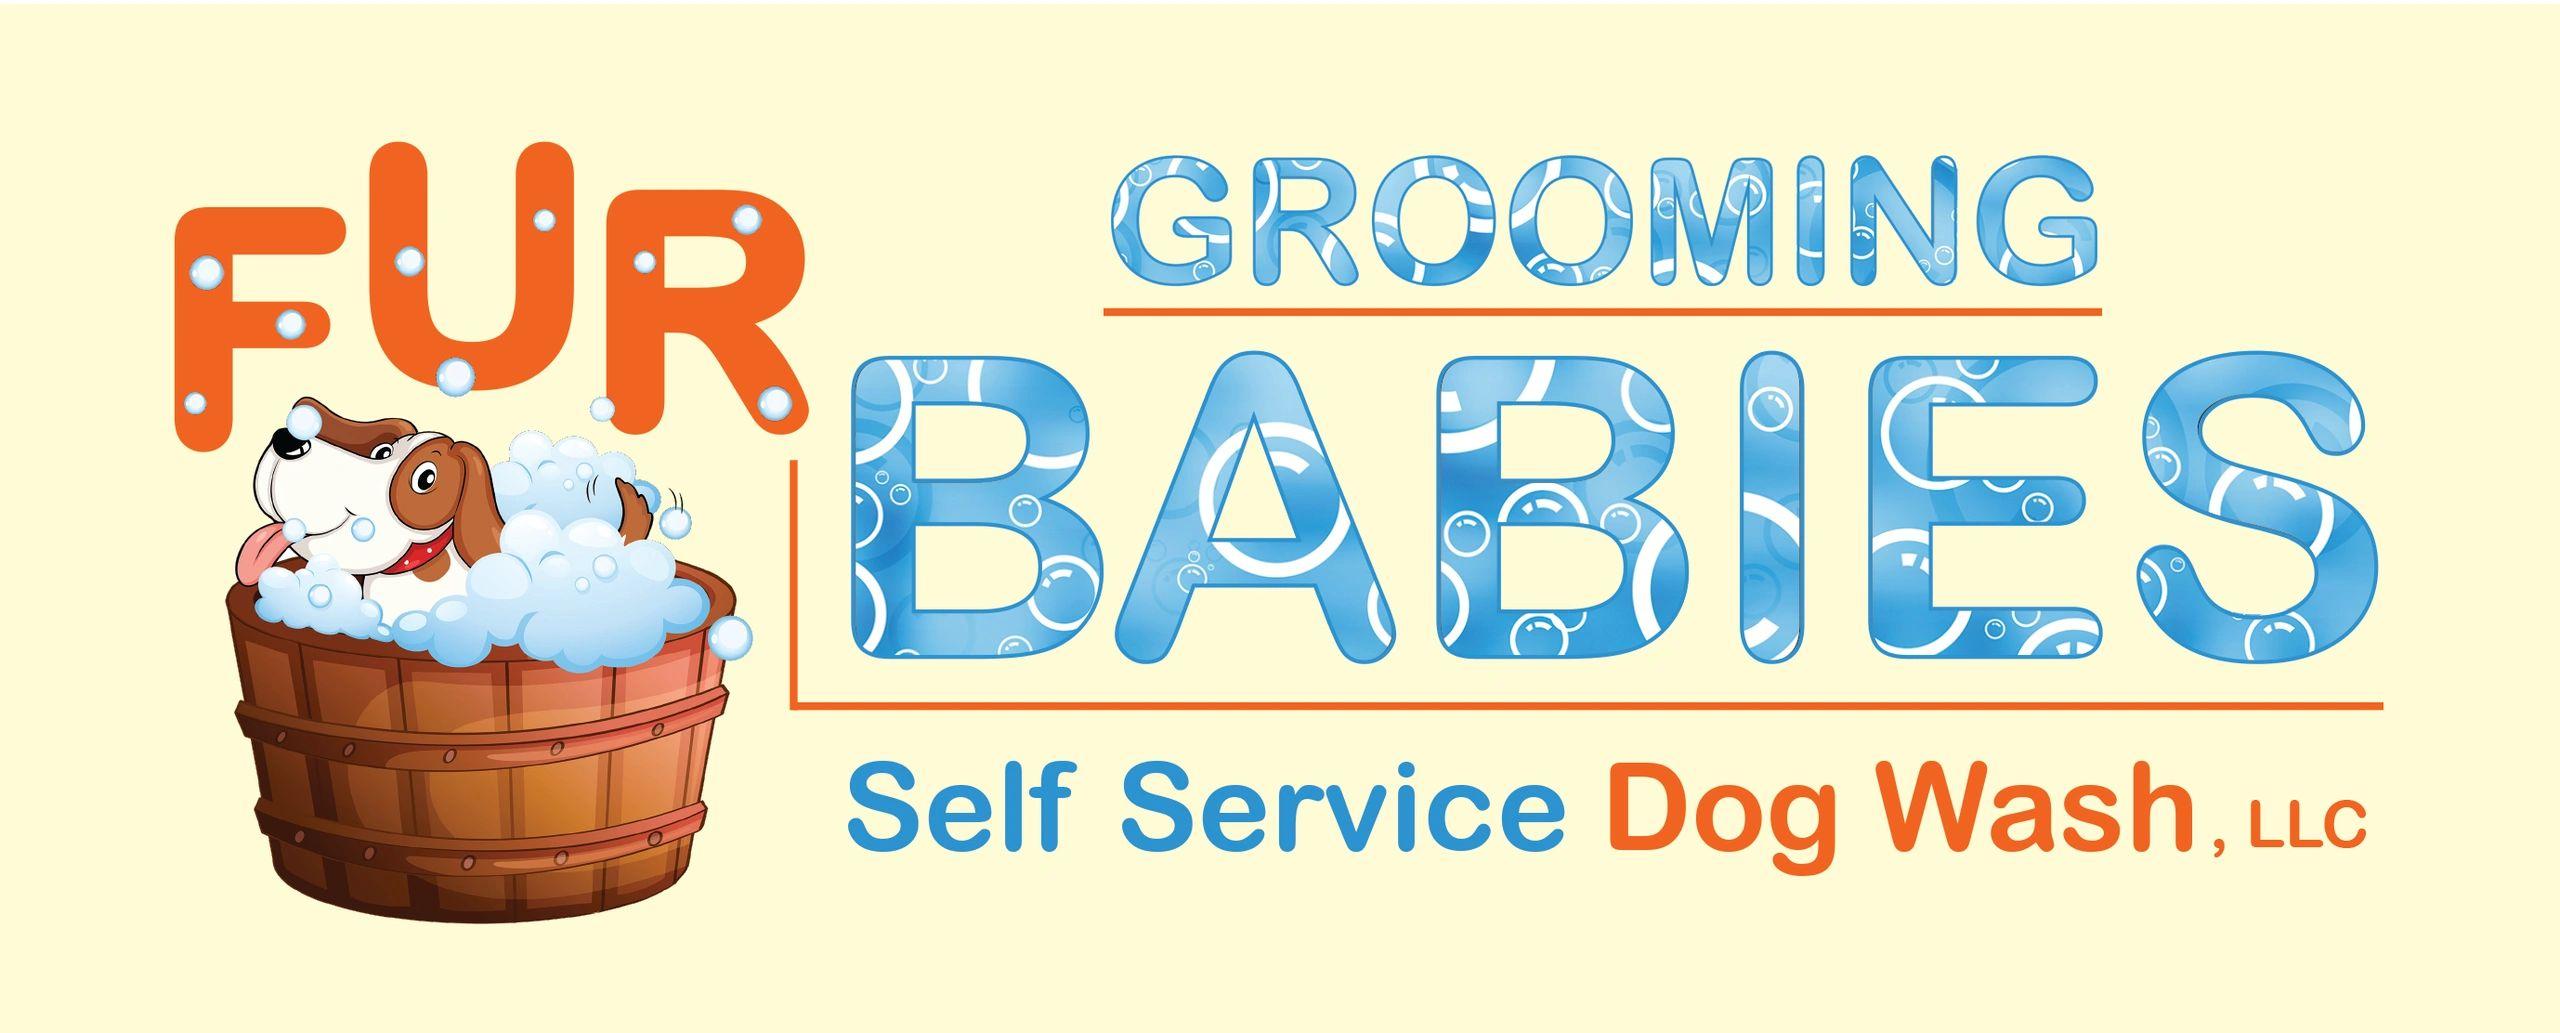 Fur babies self service dog washllc grooming self wash dog fur fur babies self service dog washllc grooming self wash dog fur babies self service dog washllc solutioingenieria Image collections